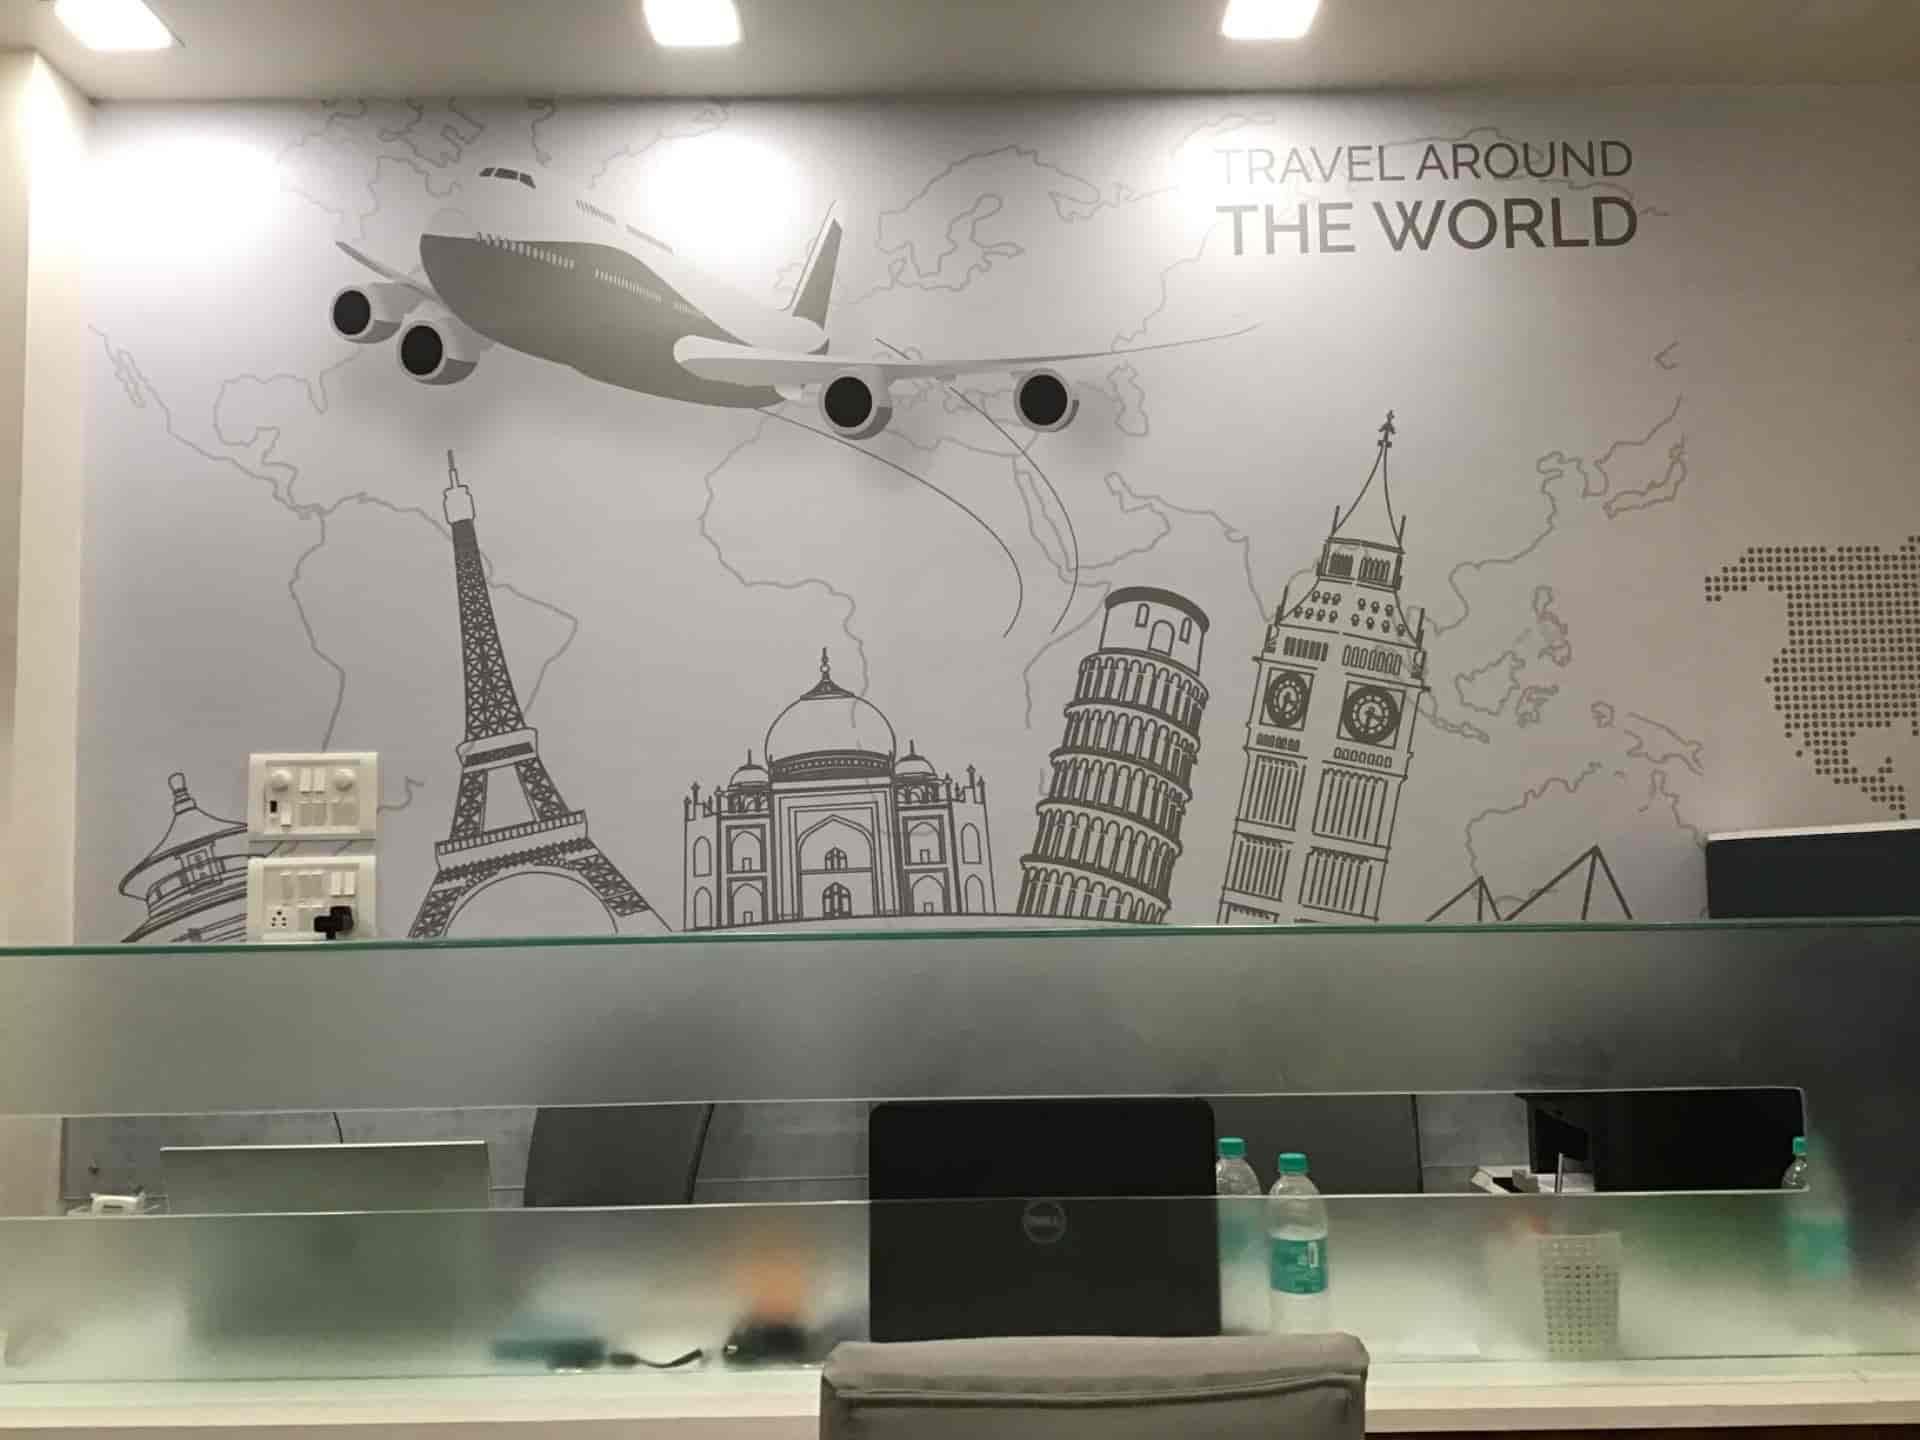 Faiza International Travels, Santacruz West - Travel Agents in Mumbai - Justdial